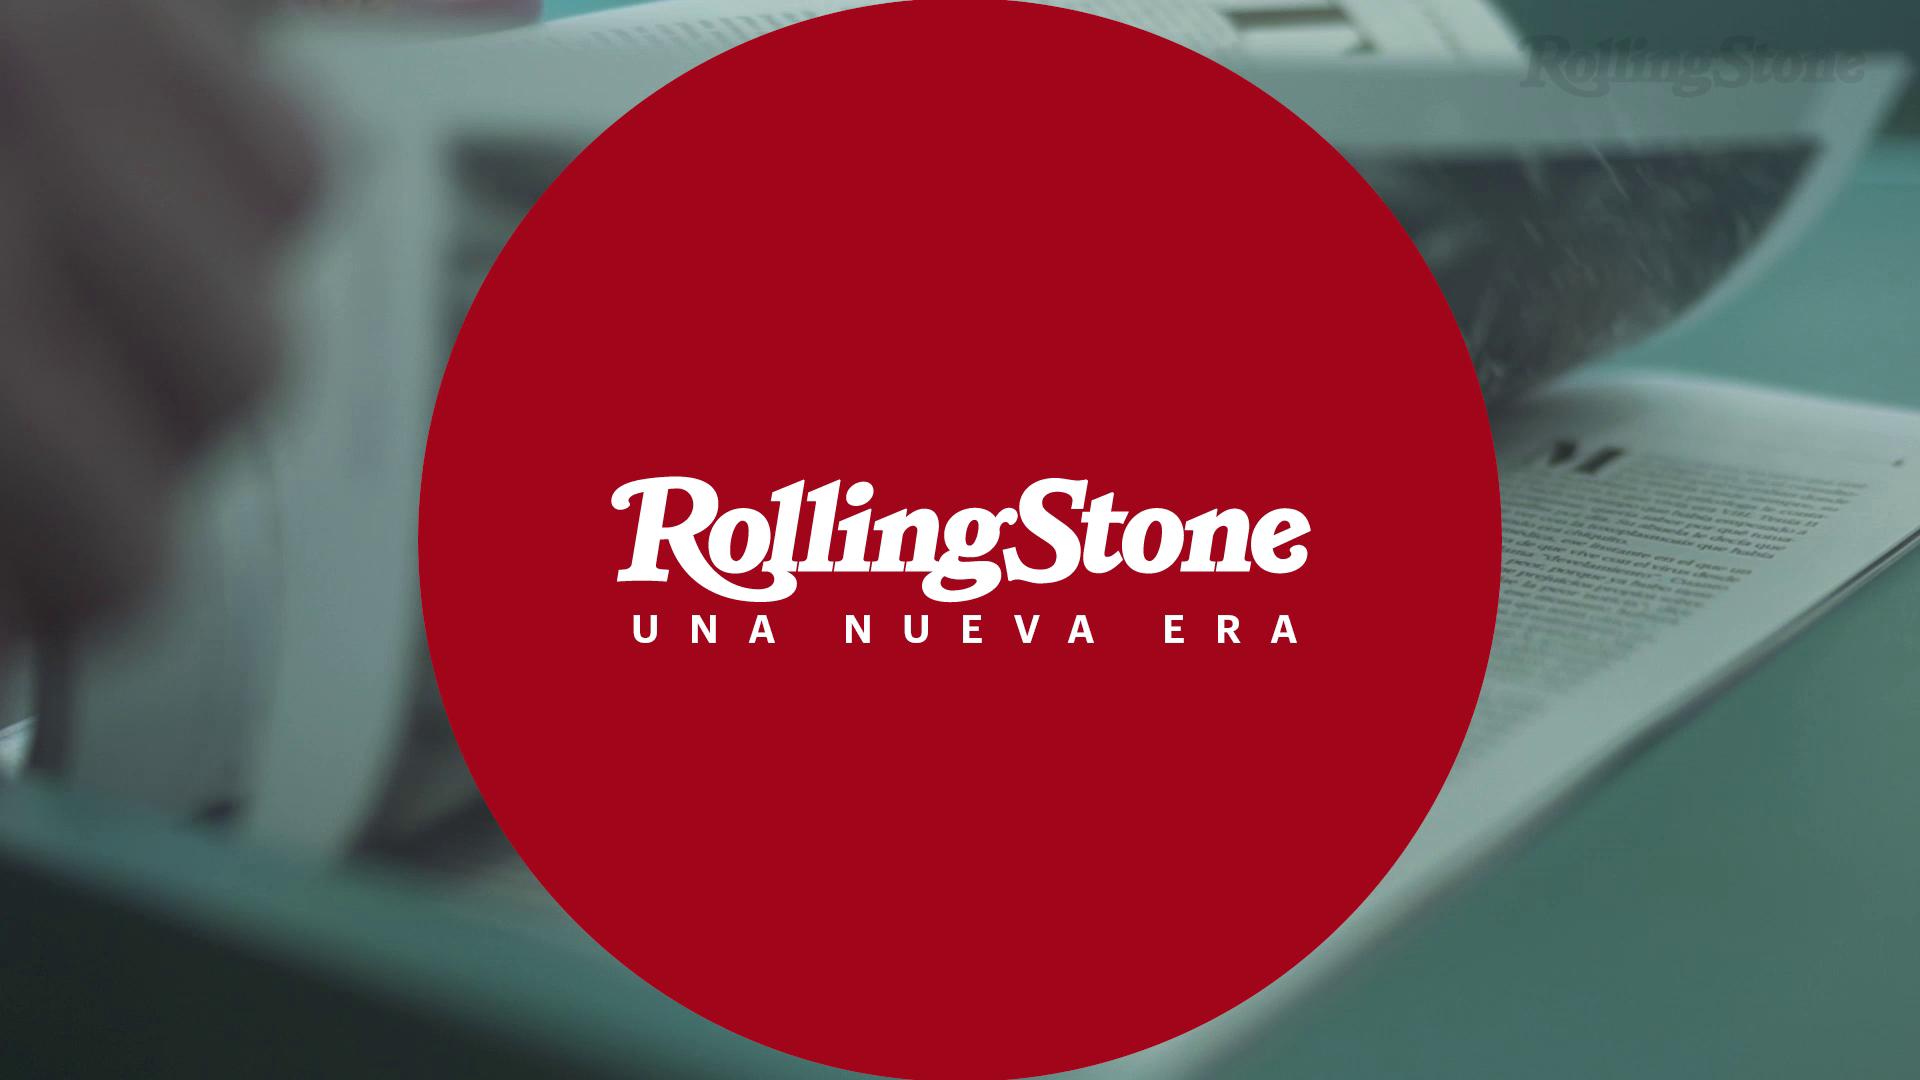 Rolling Stone – Una Nueva Era